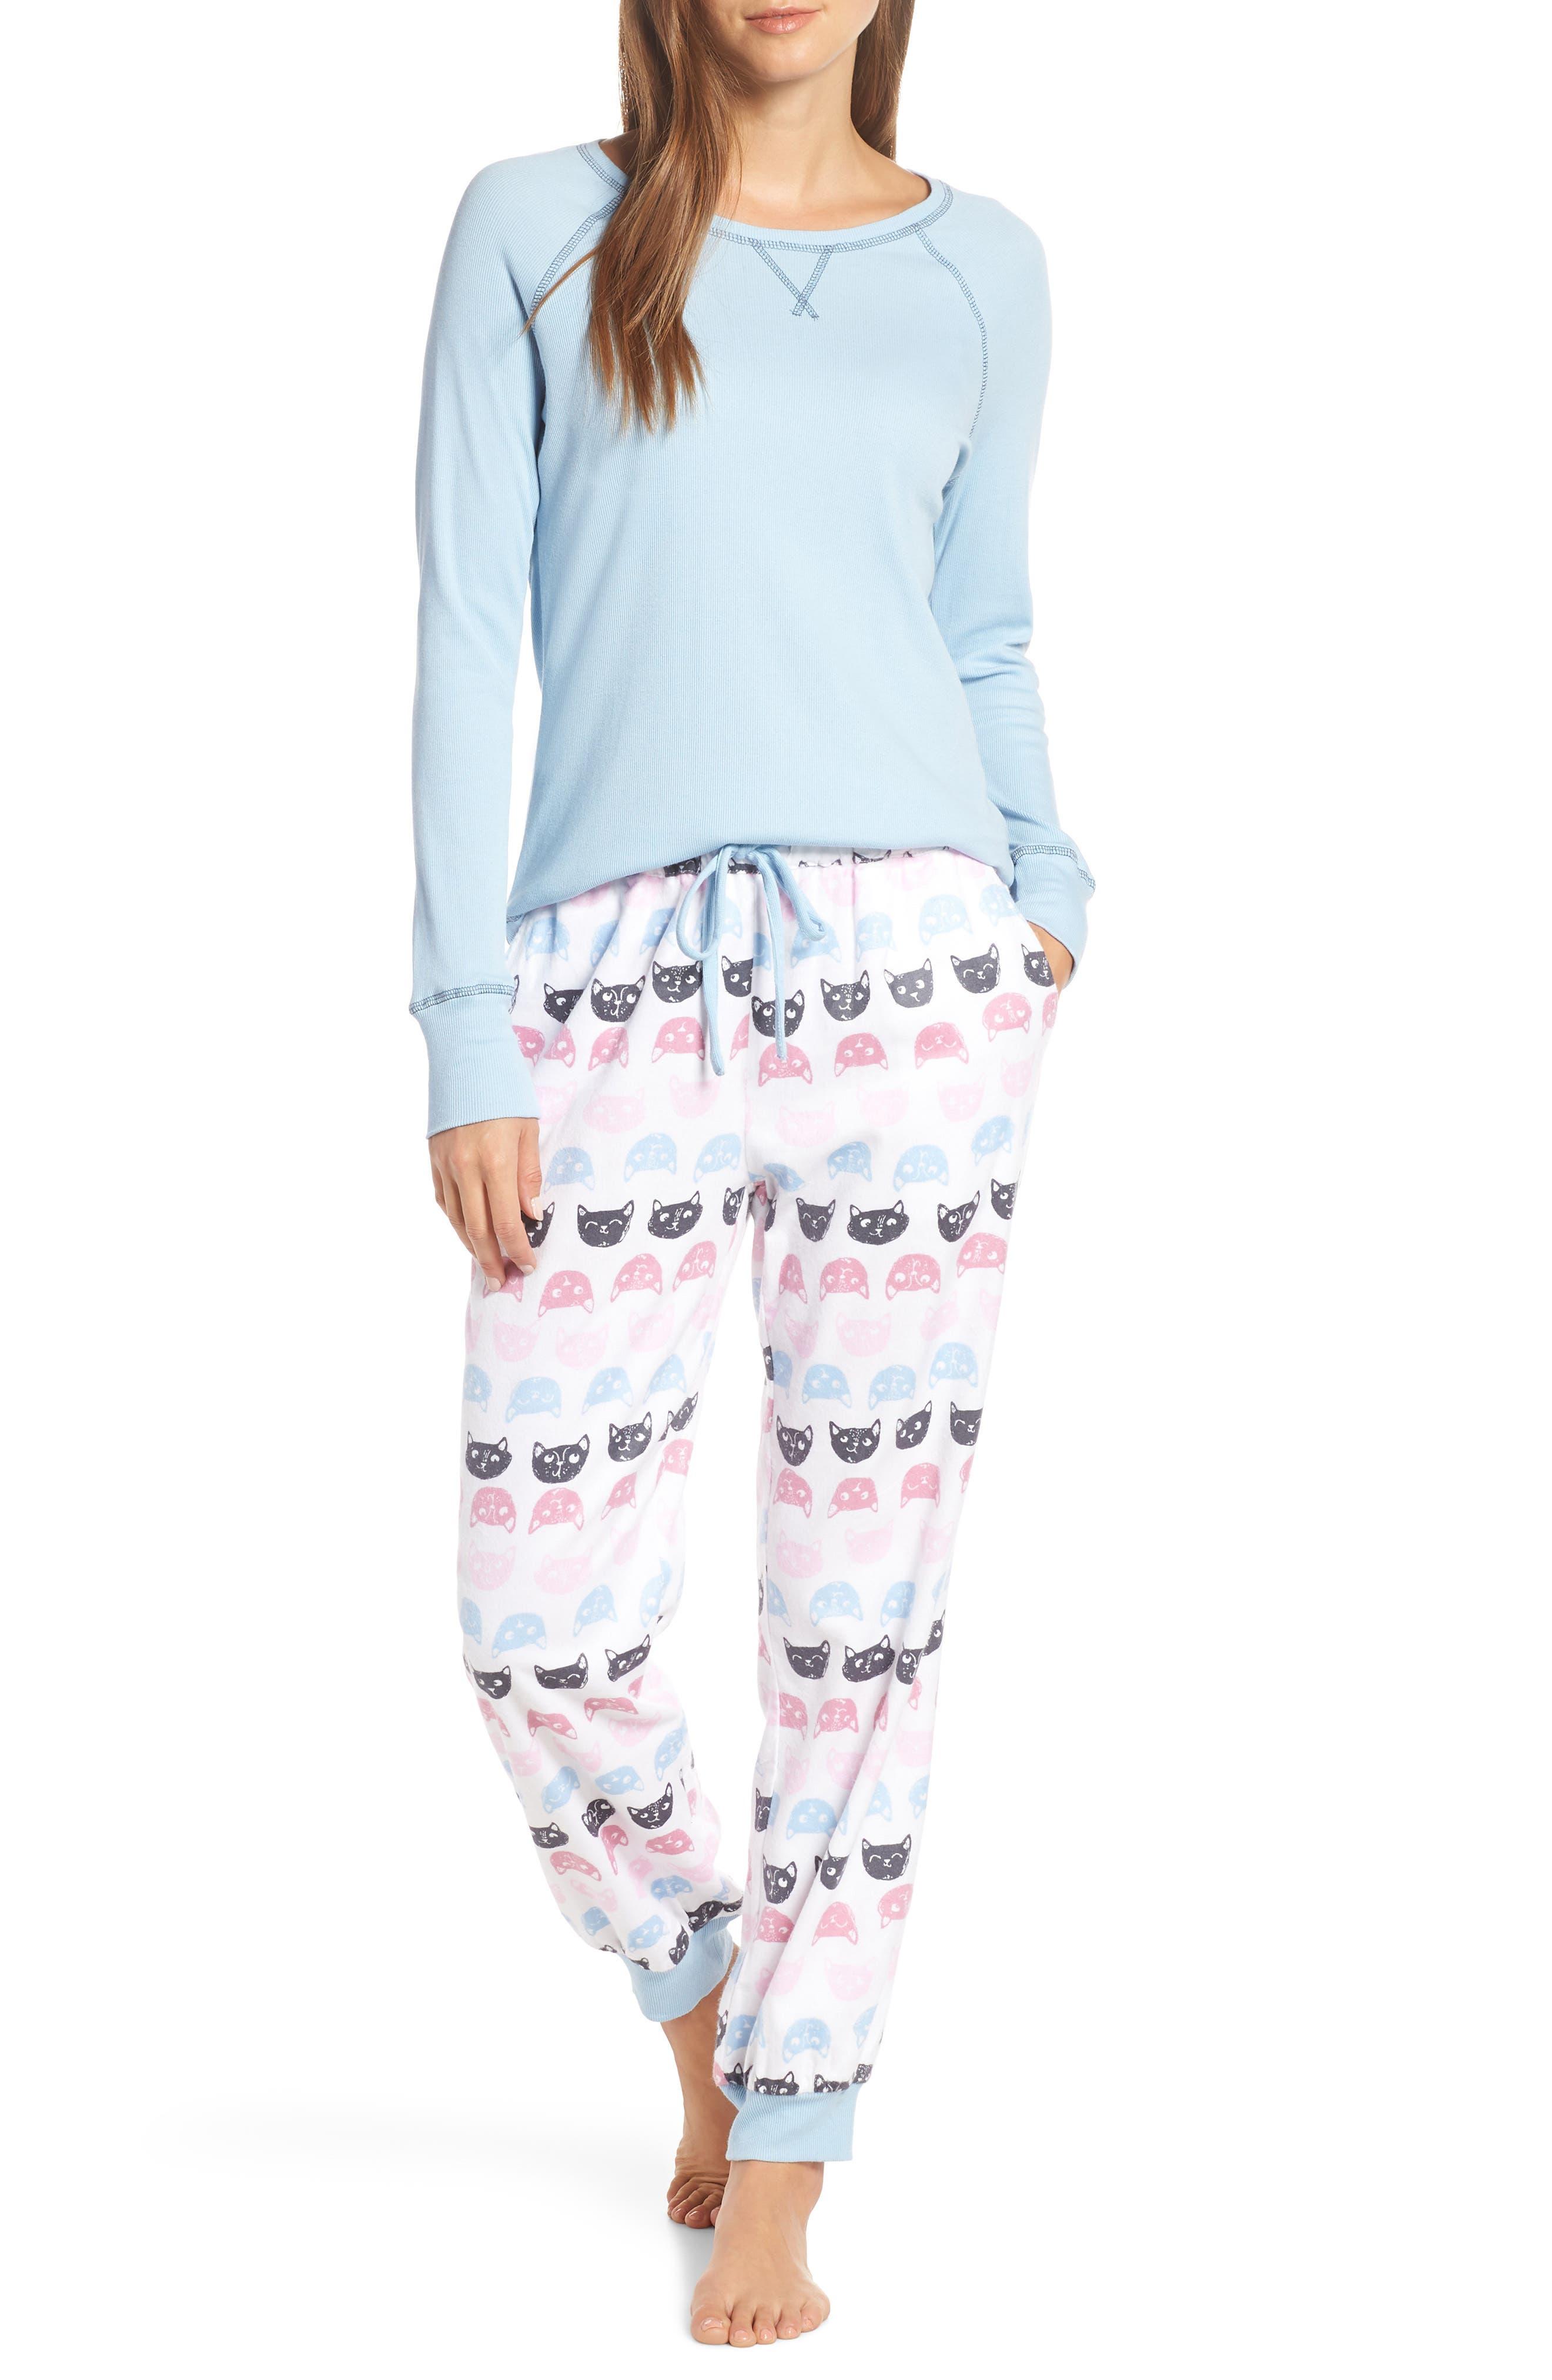 Munki Munki Knit & Flannel Pajamas, White